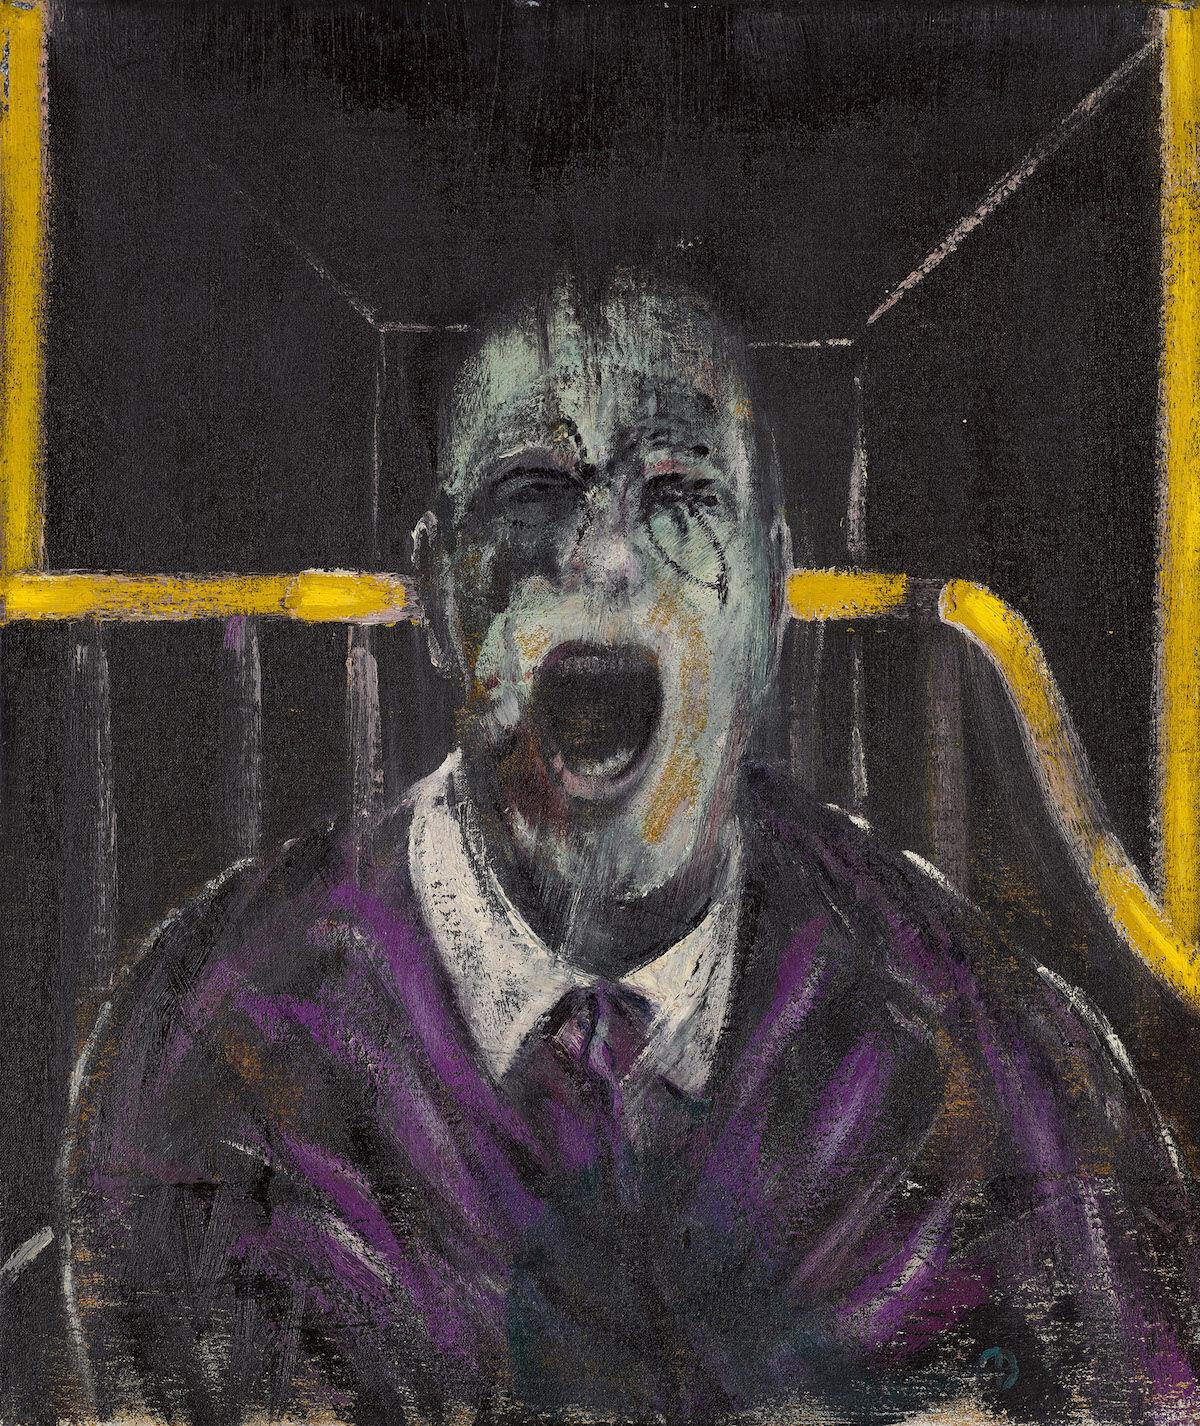 Francis Bacon, Study for a Head, 1952. Est. $20 million–$30 million. Courtesy Sotheby's.